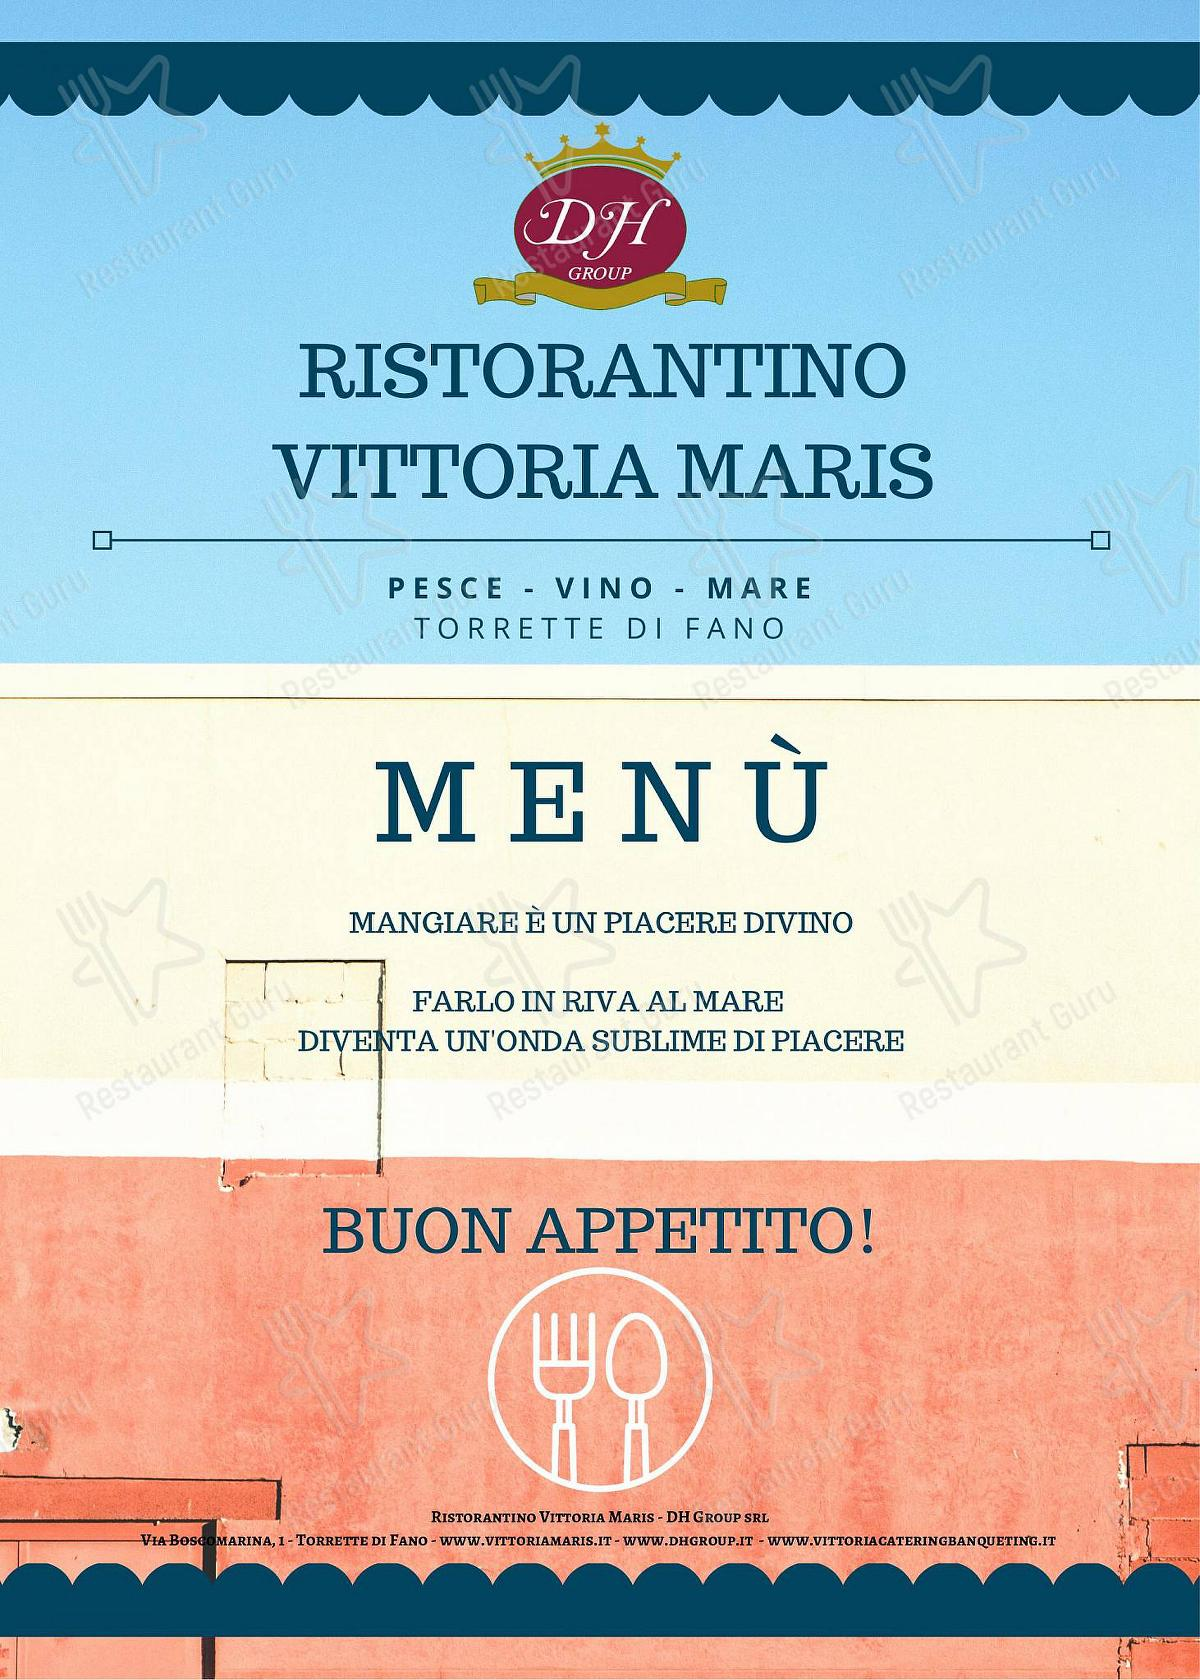 Check out the menu for vittoria maris